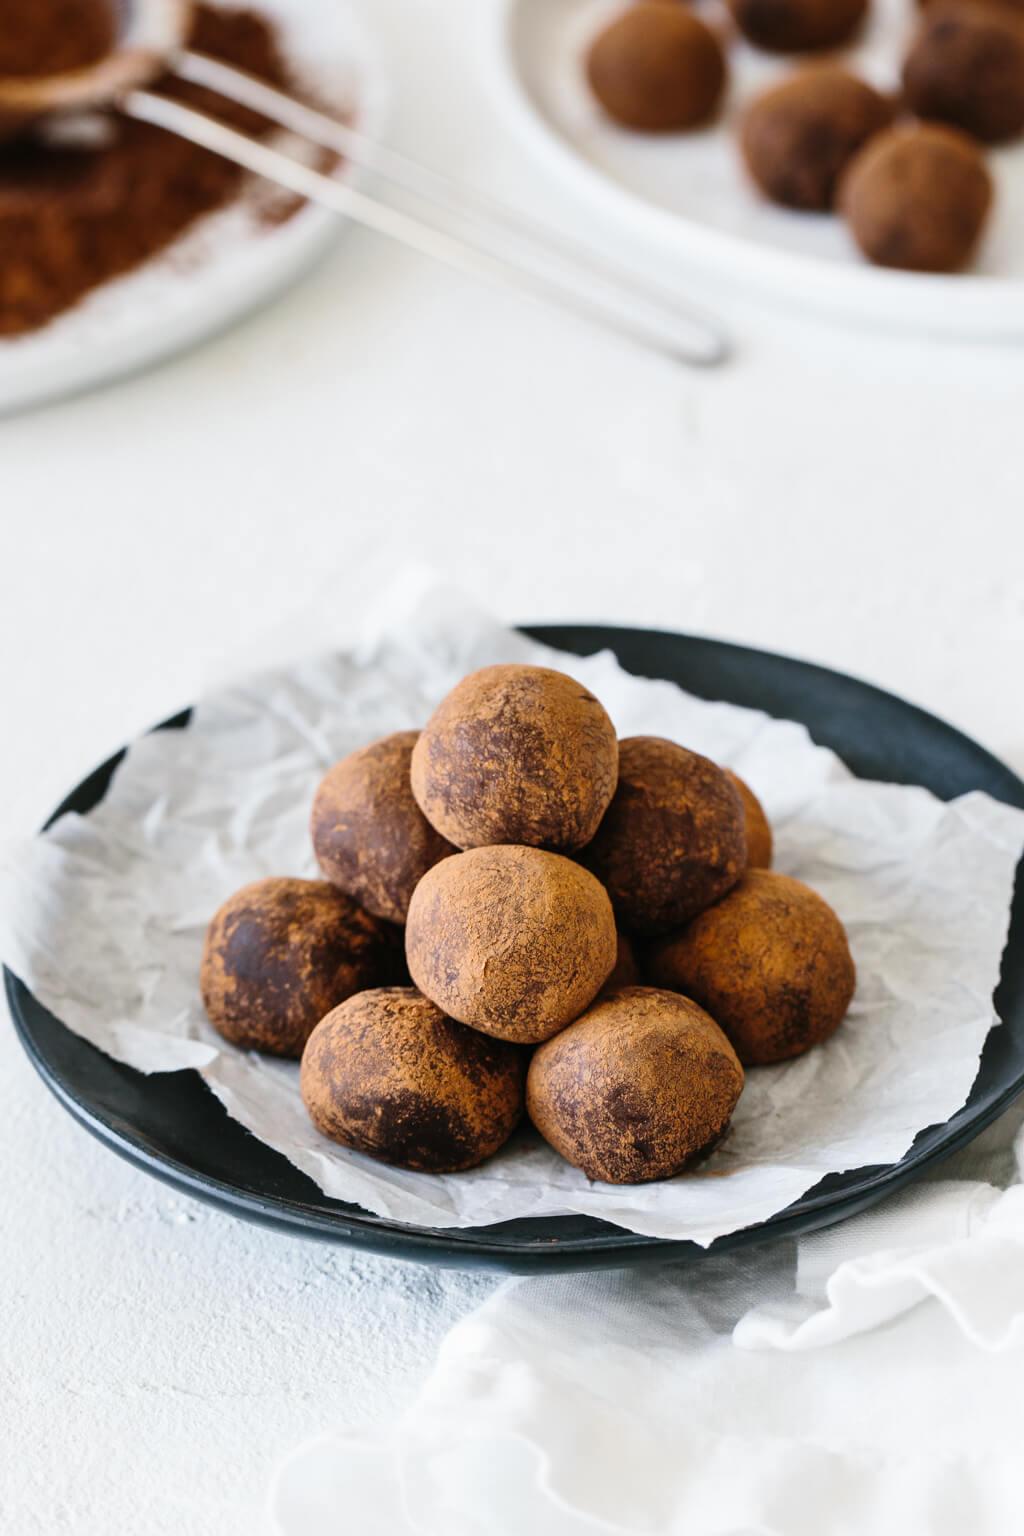 Plate of peppermint truffles.